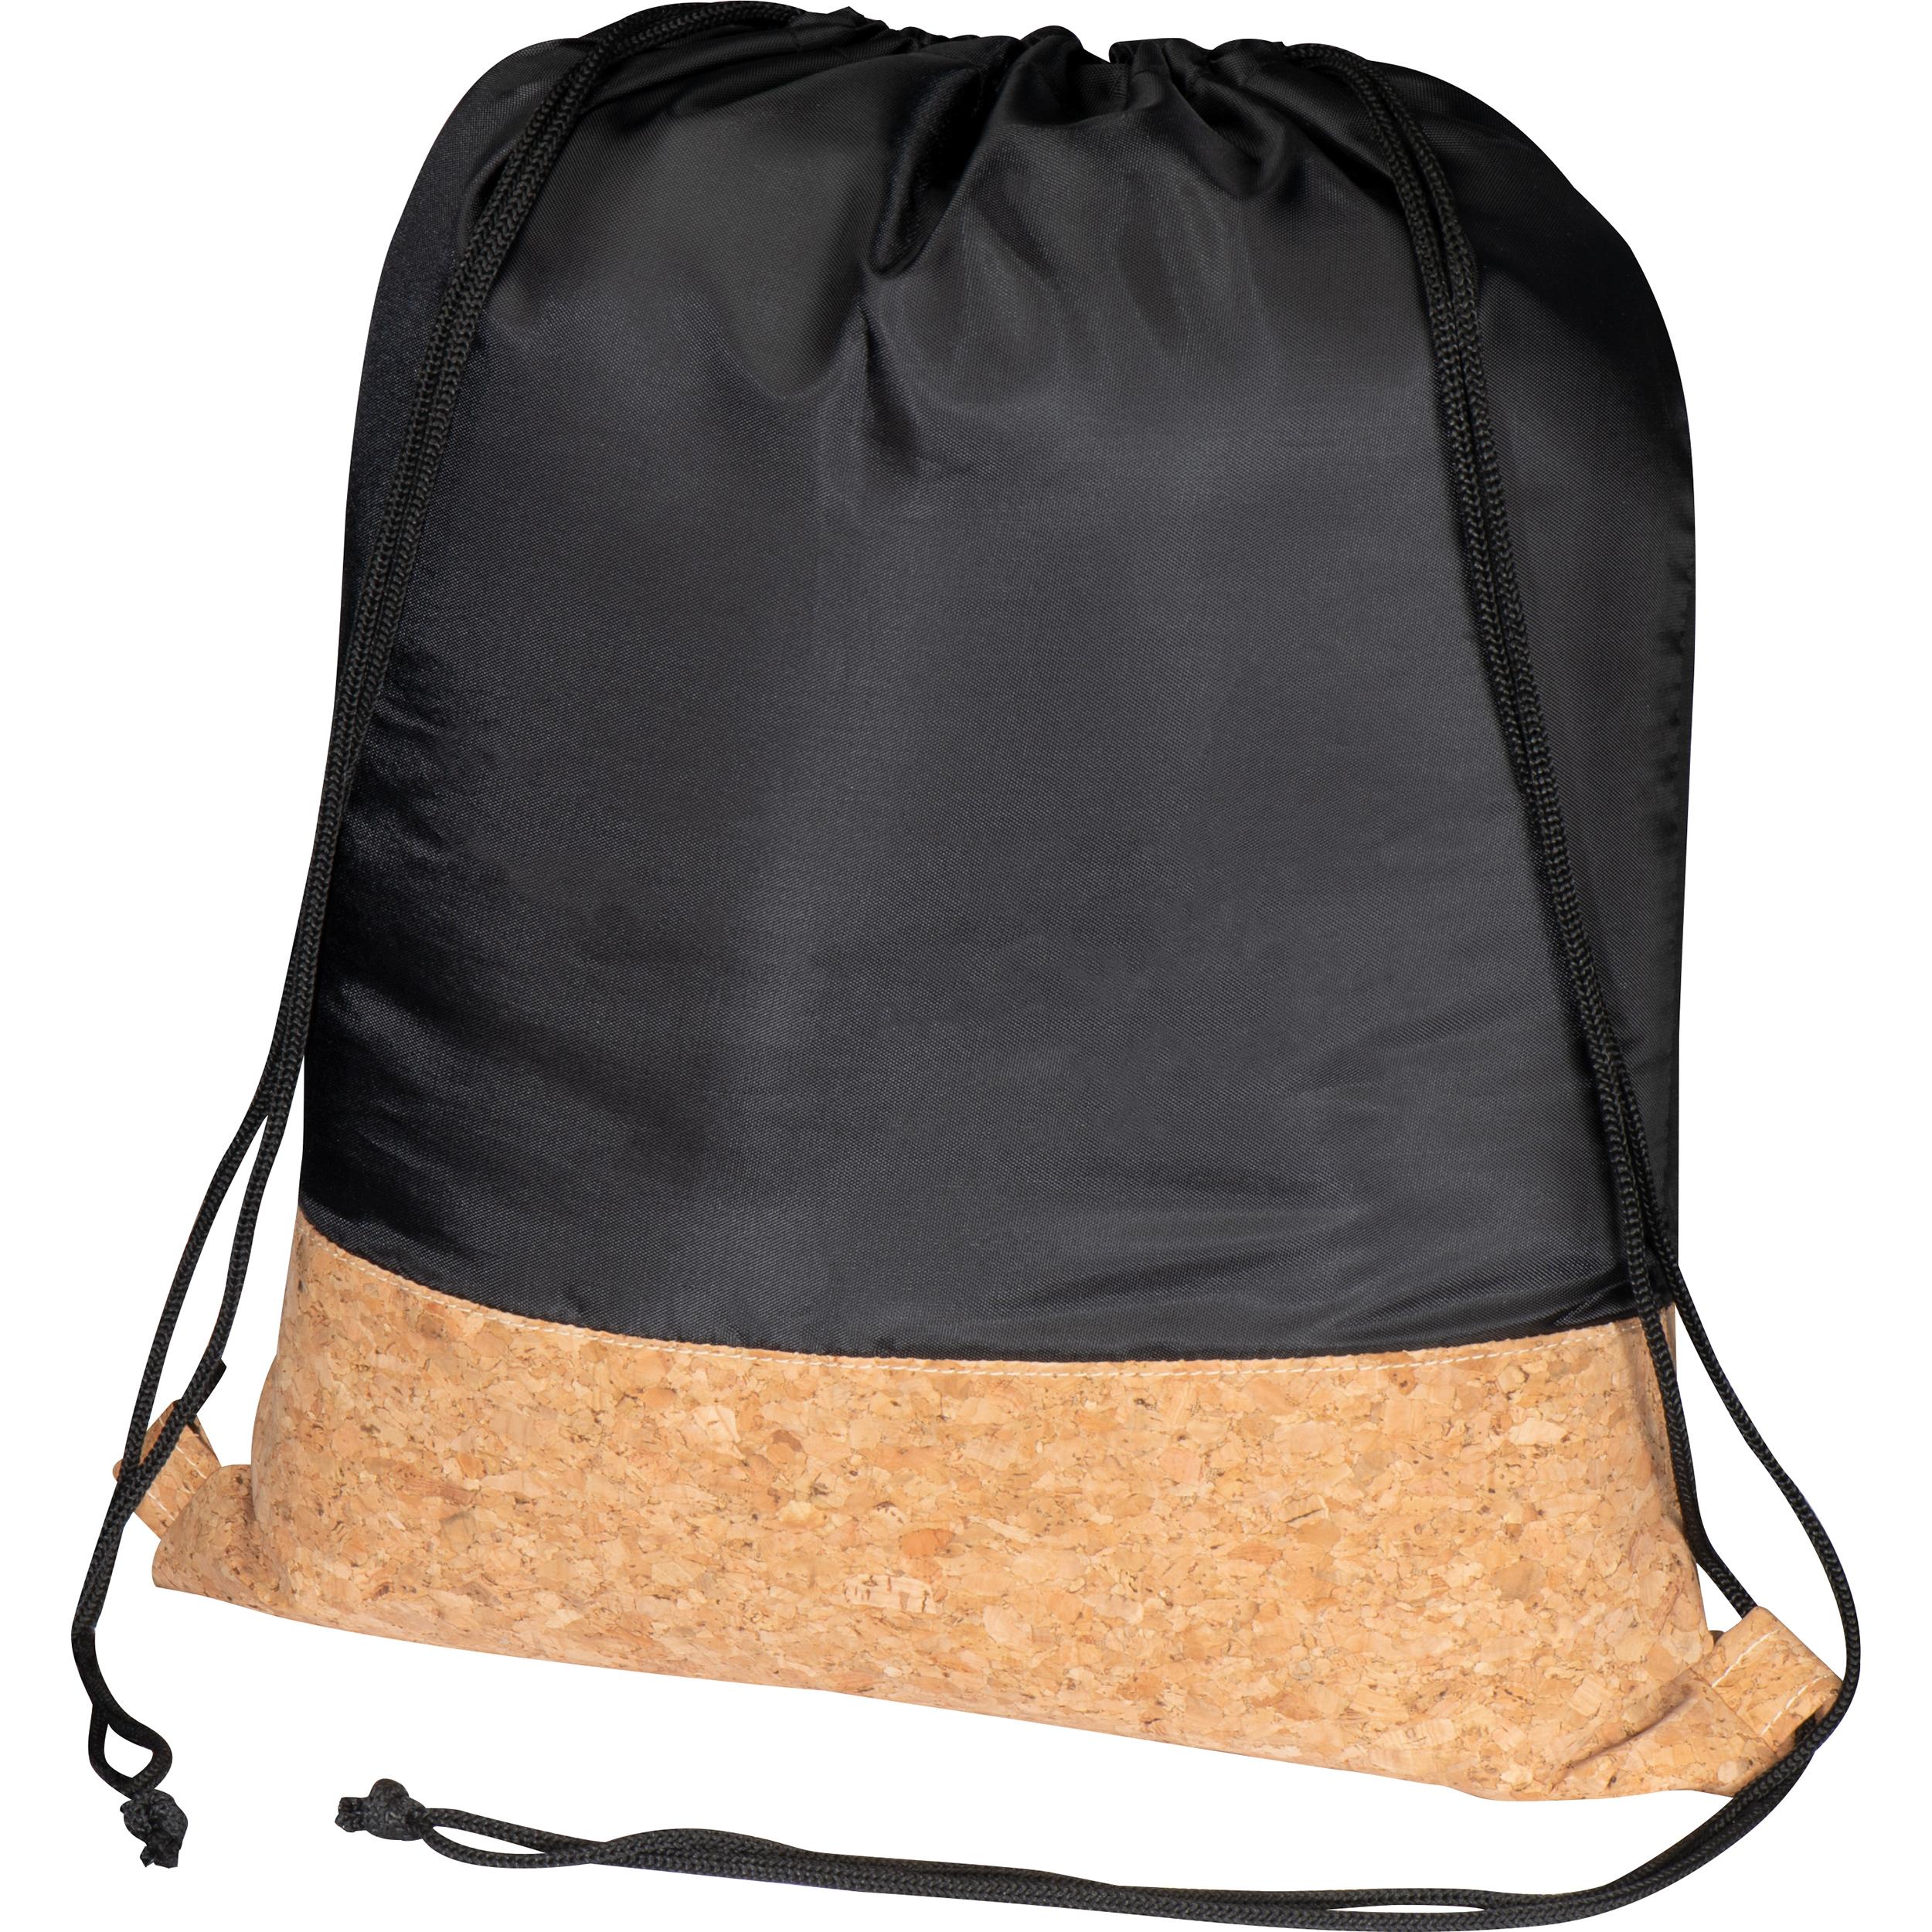 Gymbag aus Polyester mit Korkboden